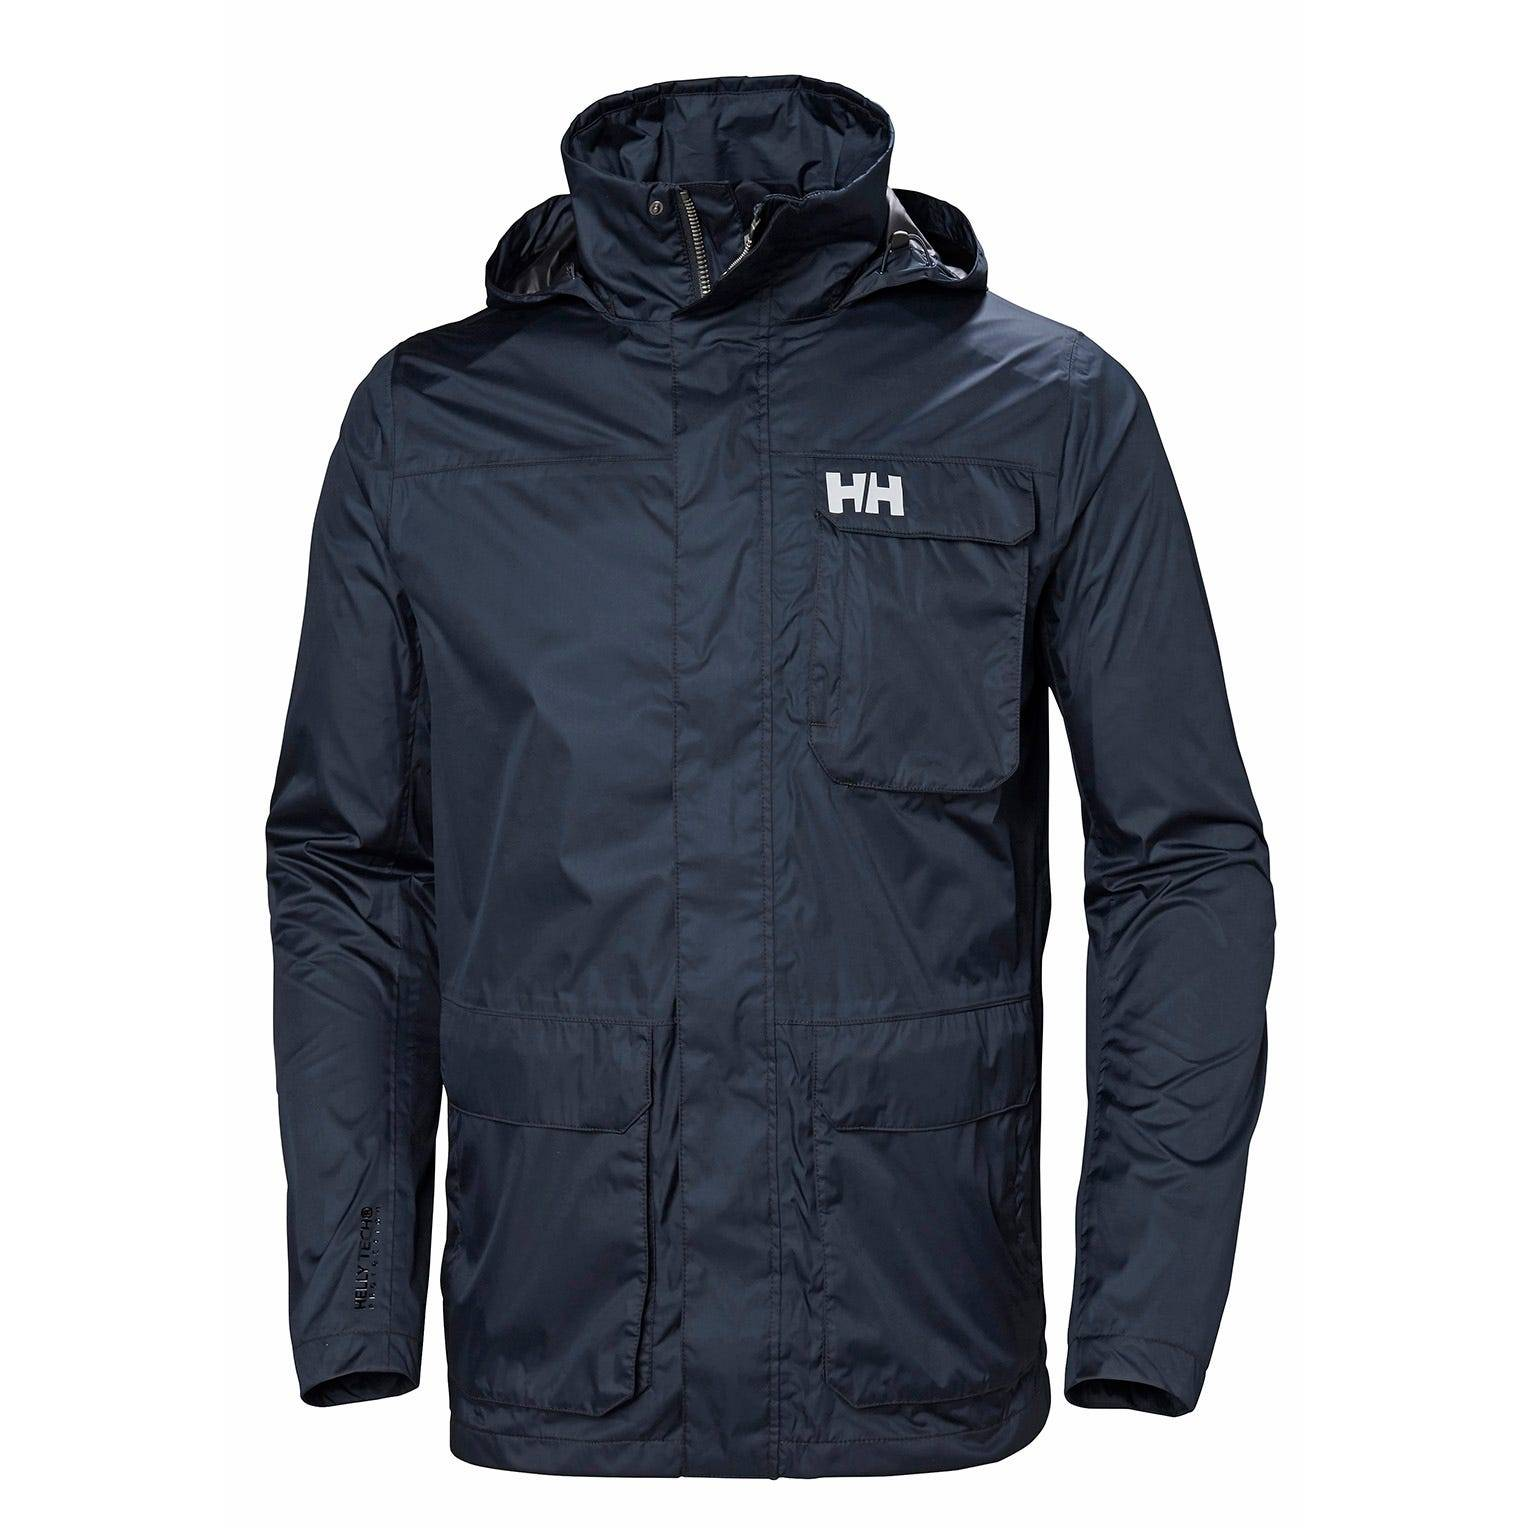 Helly Hansen Mens Urban Utility Rain Jacket Navy S